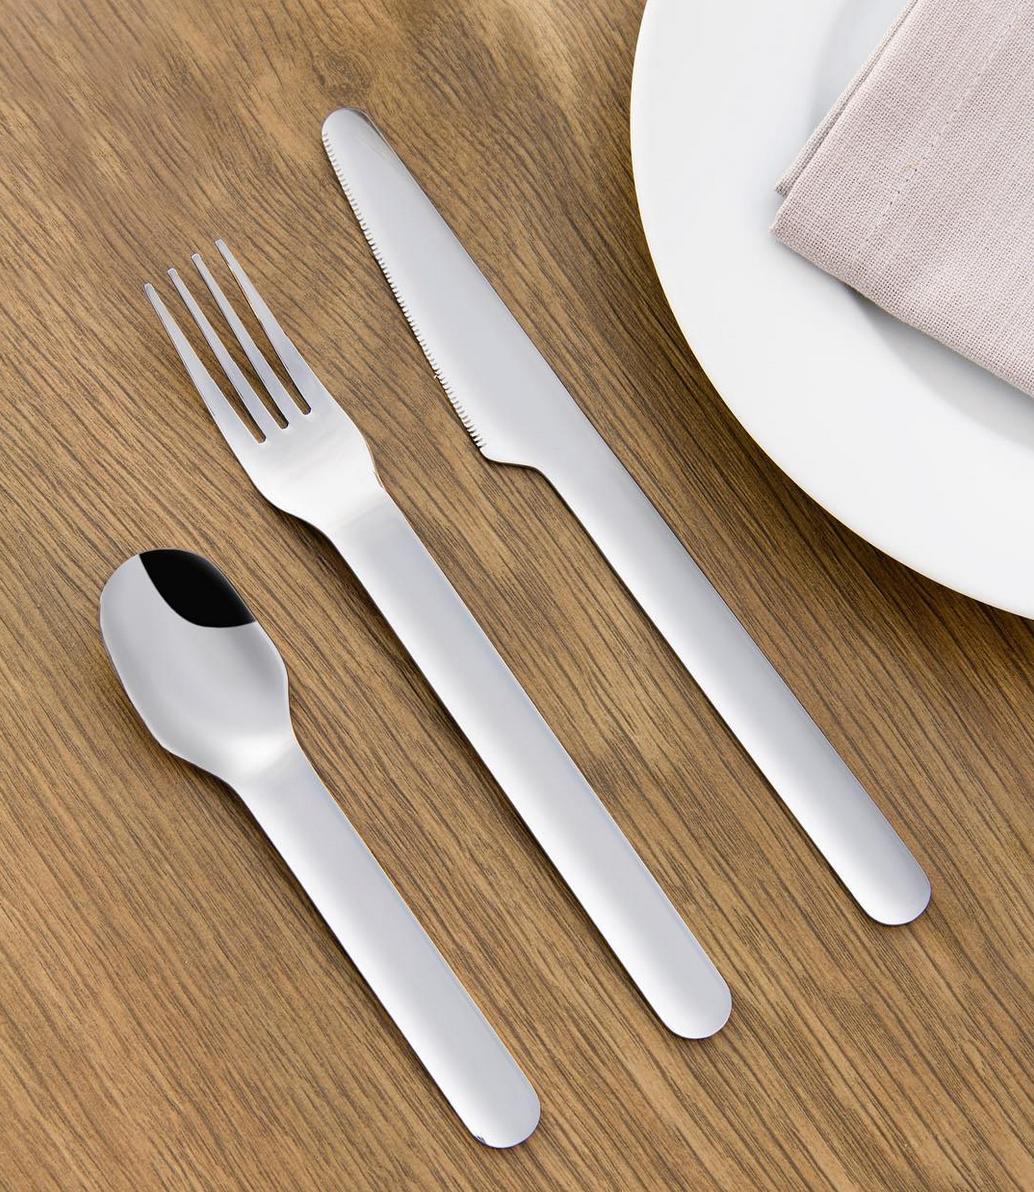 Hay cutlery | Denmark & Hay cutlery | Denmark | Nordic by Design | Pinterest | Denmark and ...